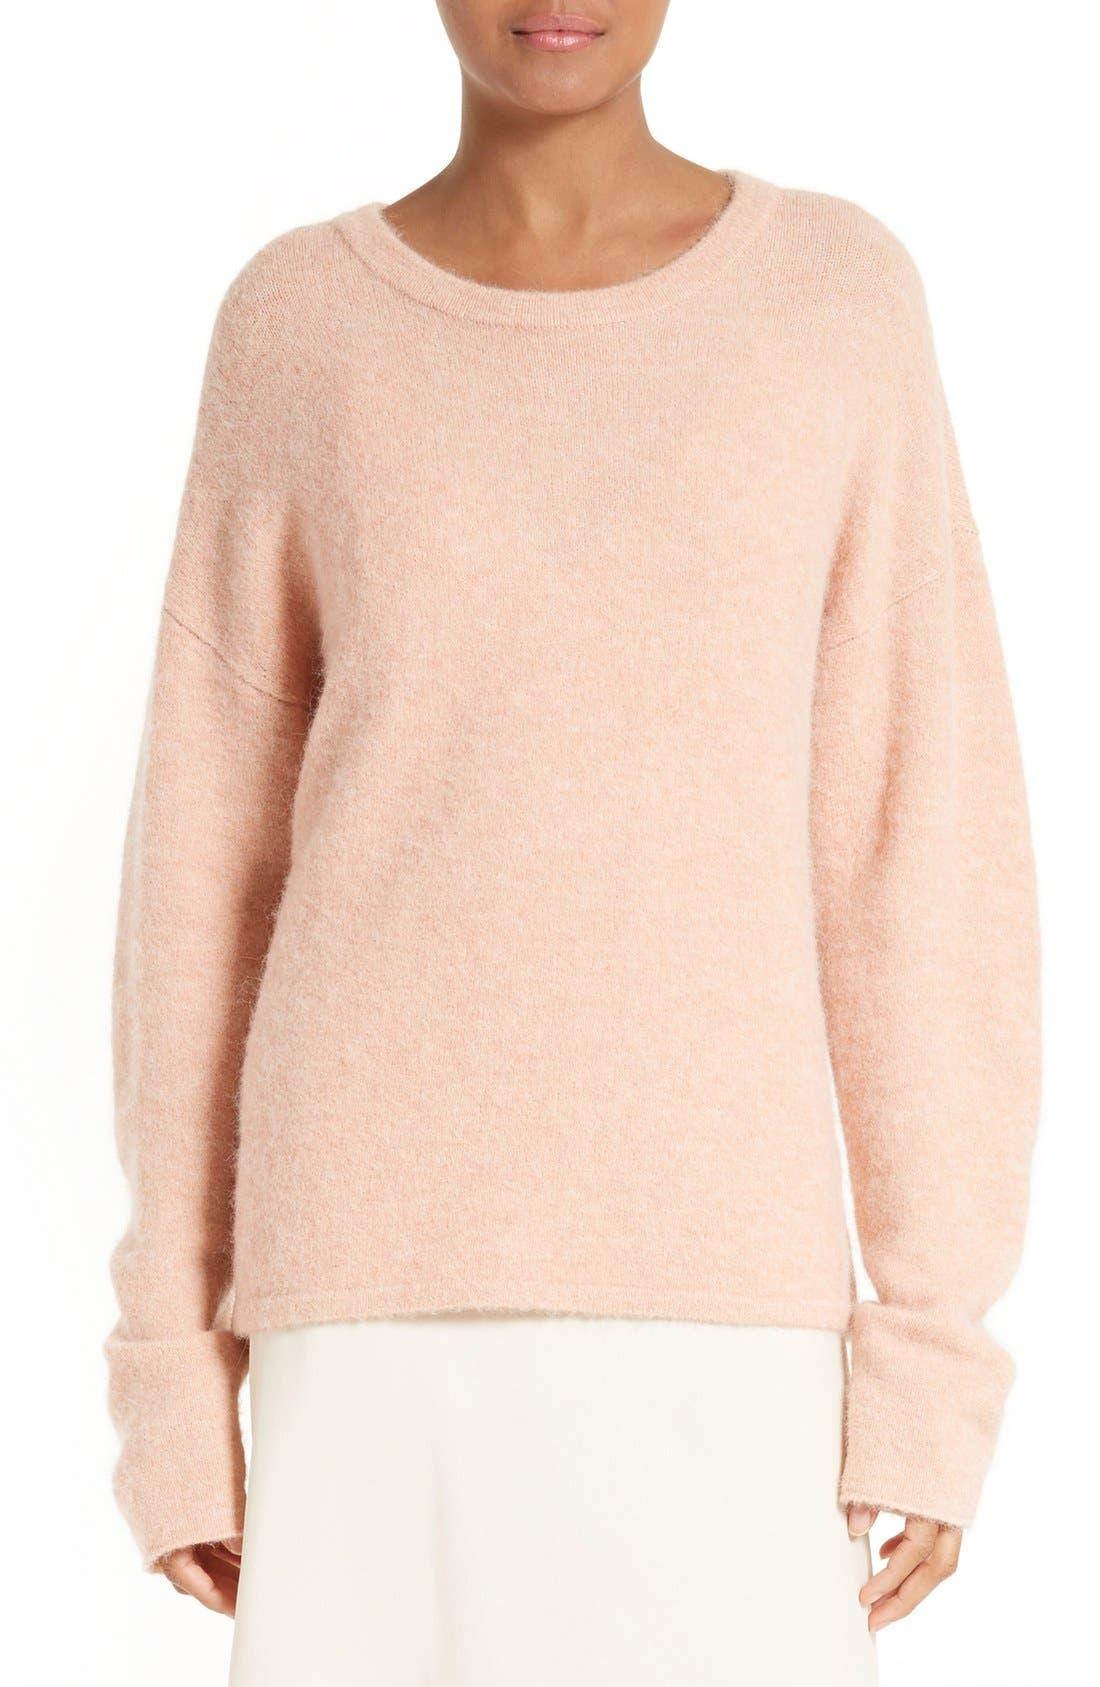 Alternate Image 1 Selected - FRAME Boxy Boyfriend Sweater